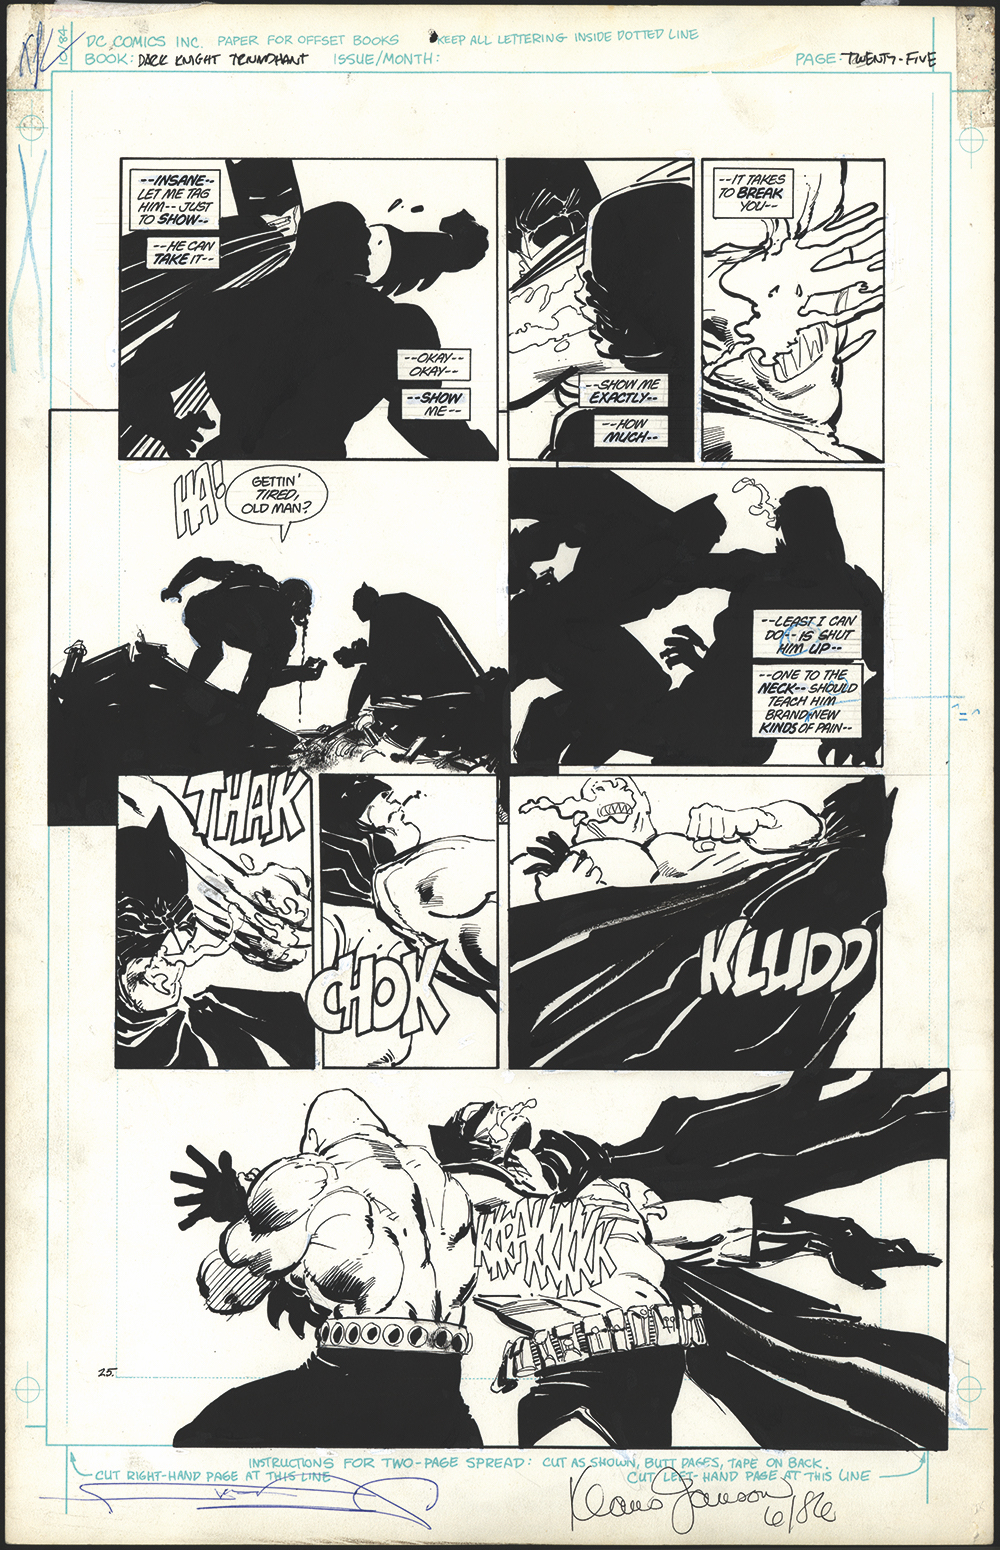 From The Dark Knight Returns Gallery Edition (Graphitti Designs)